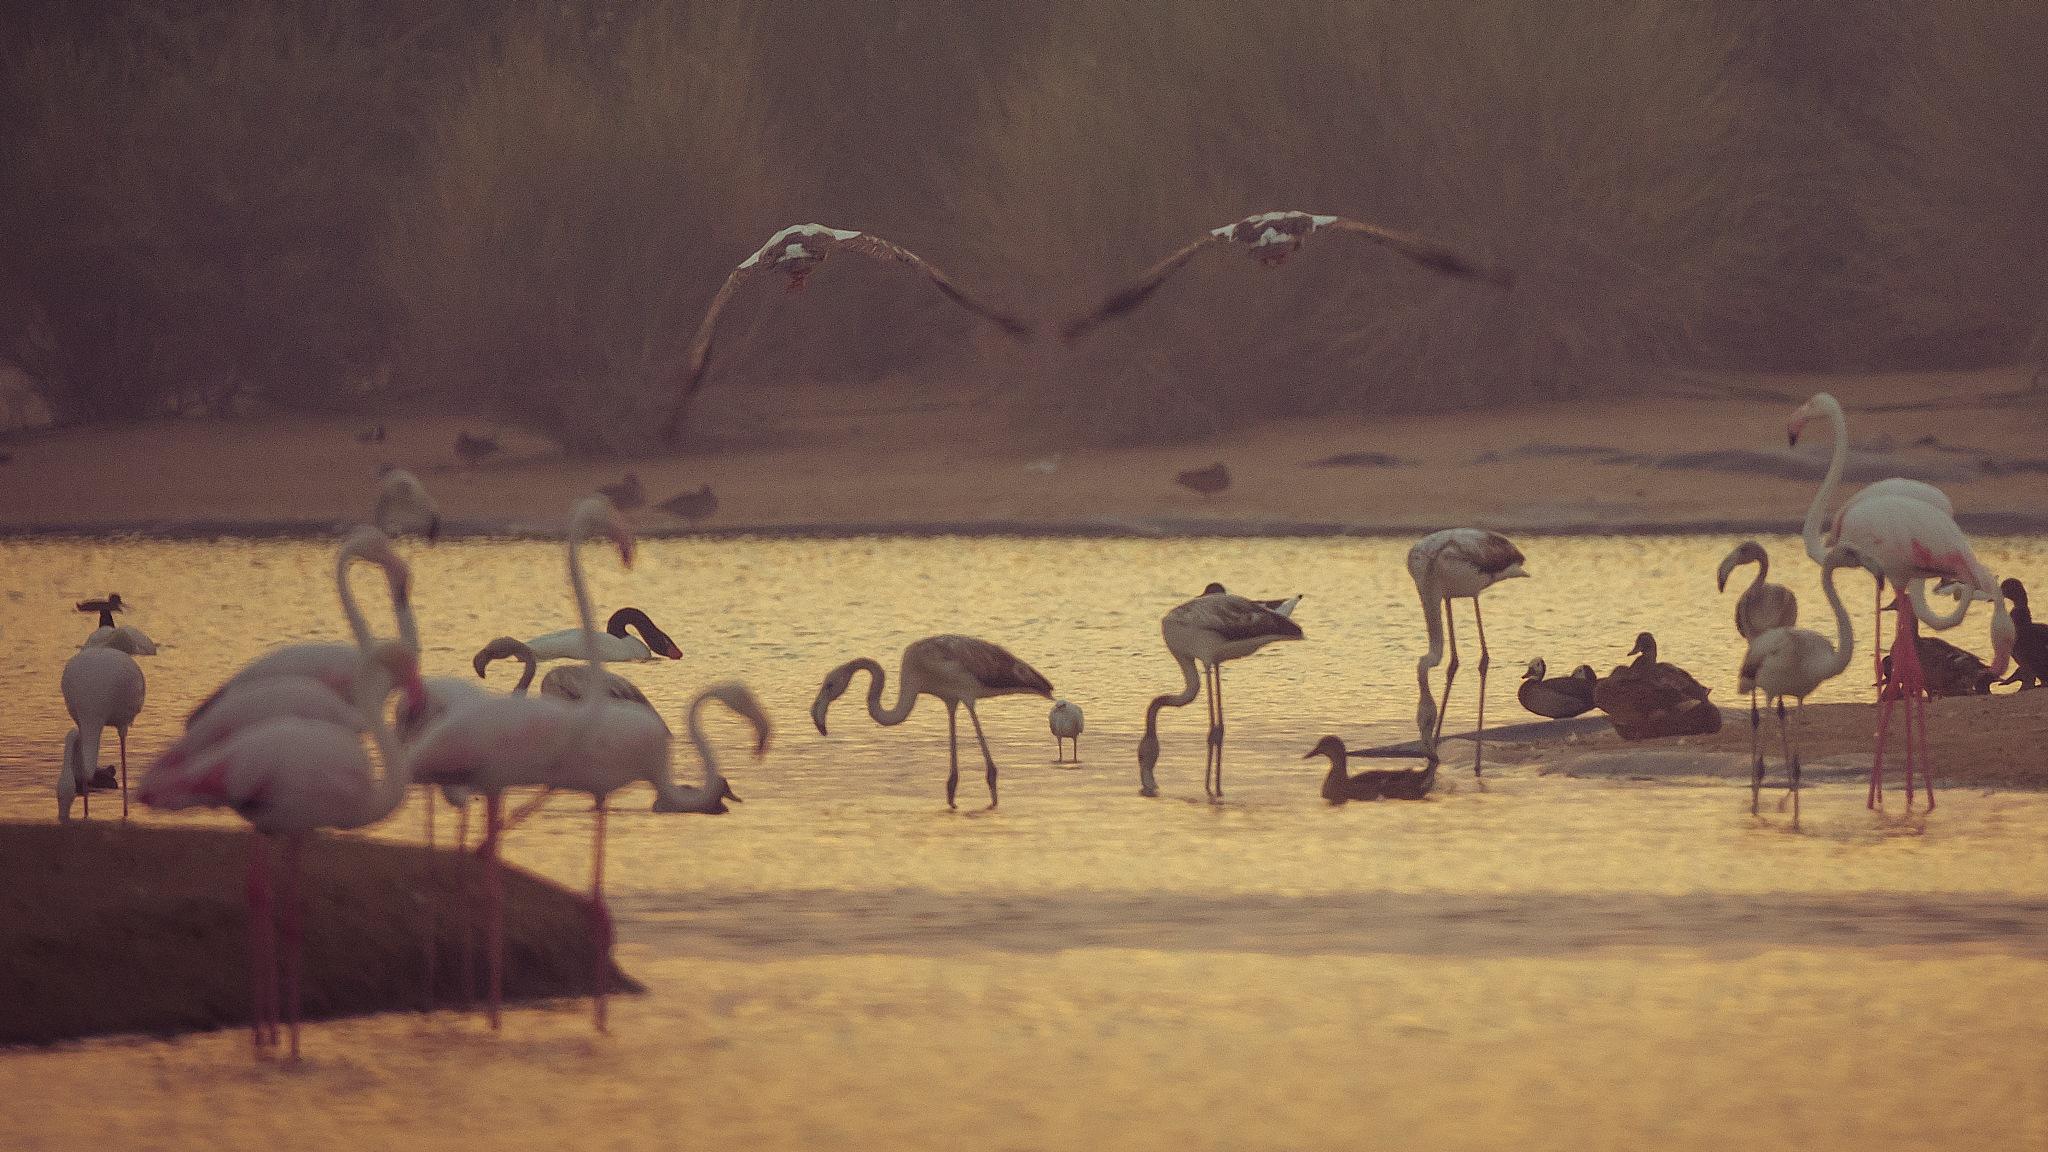 Gathering by Babar Swaleheen